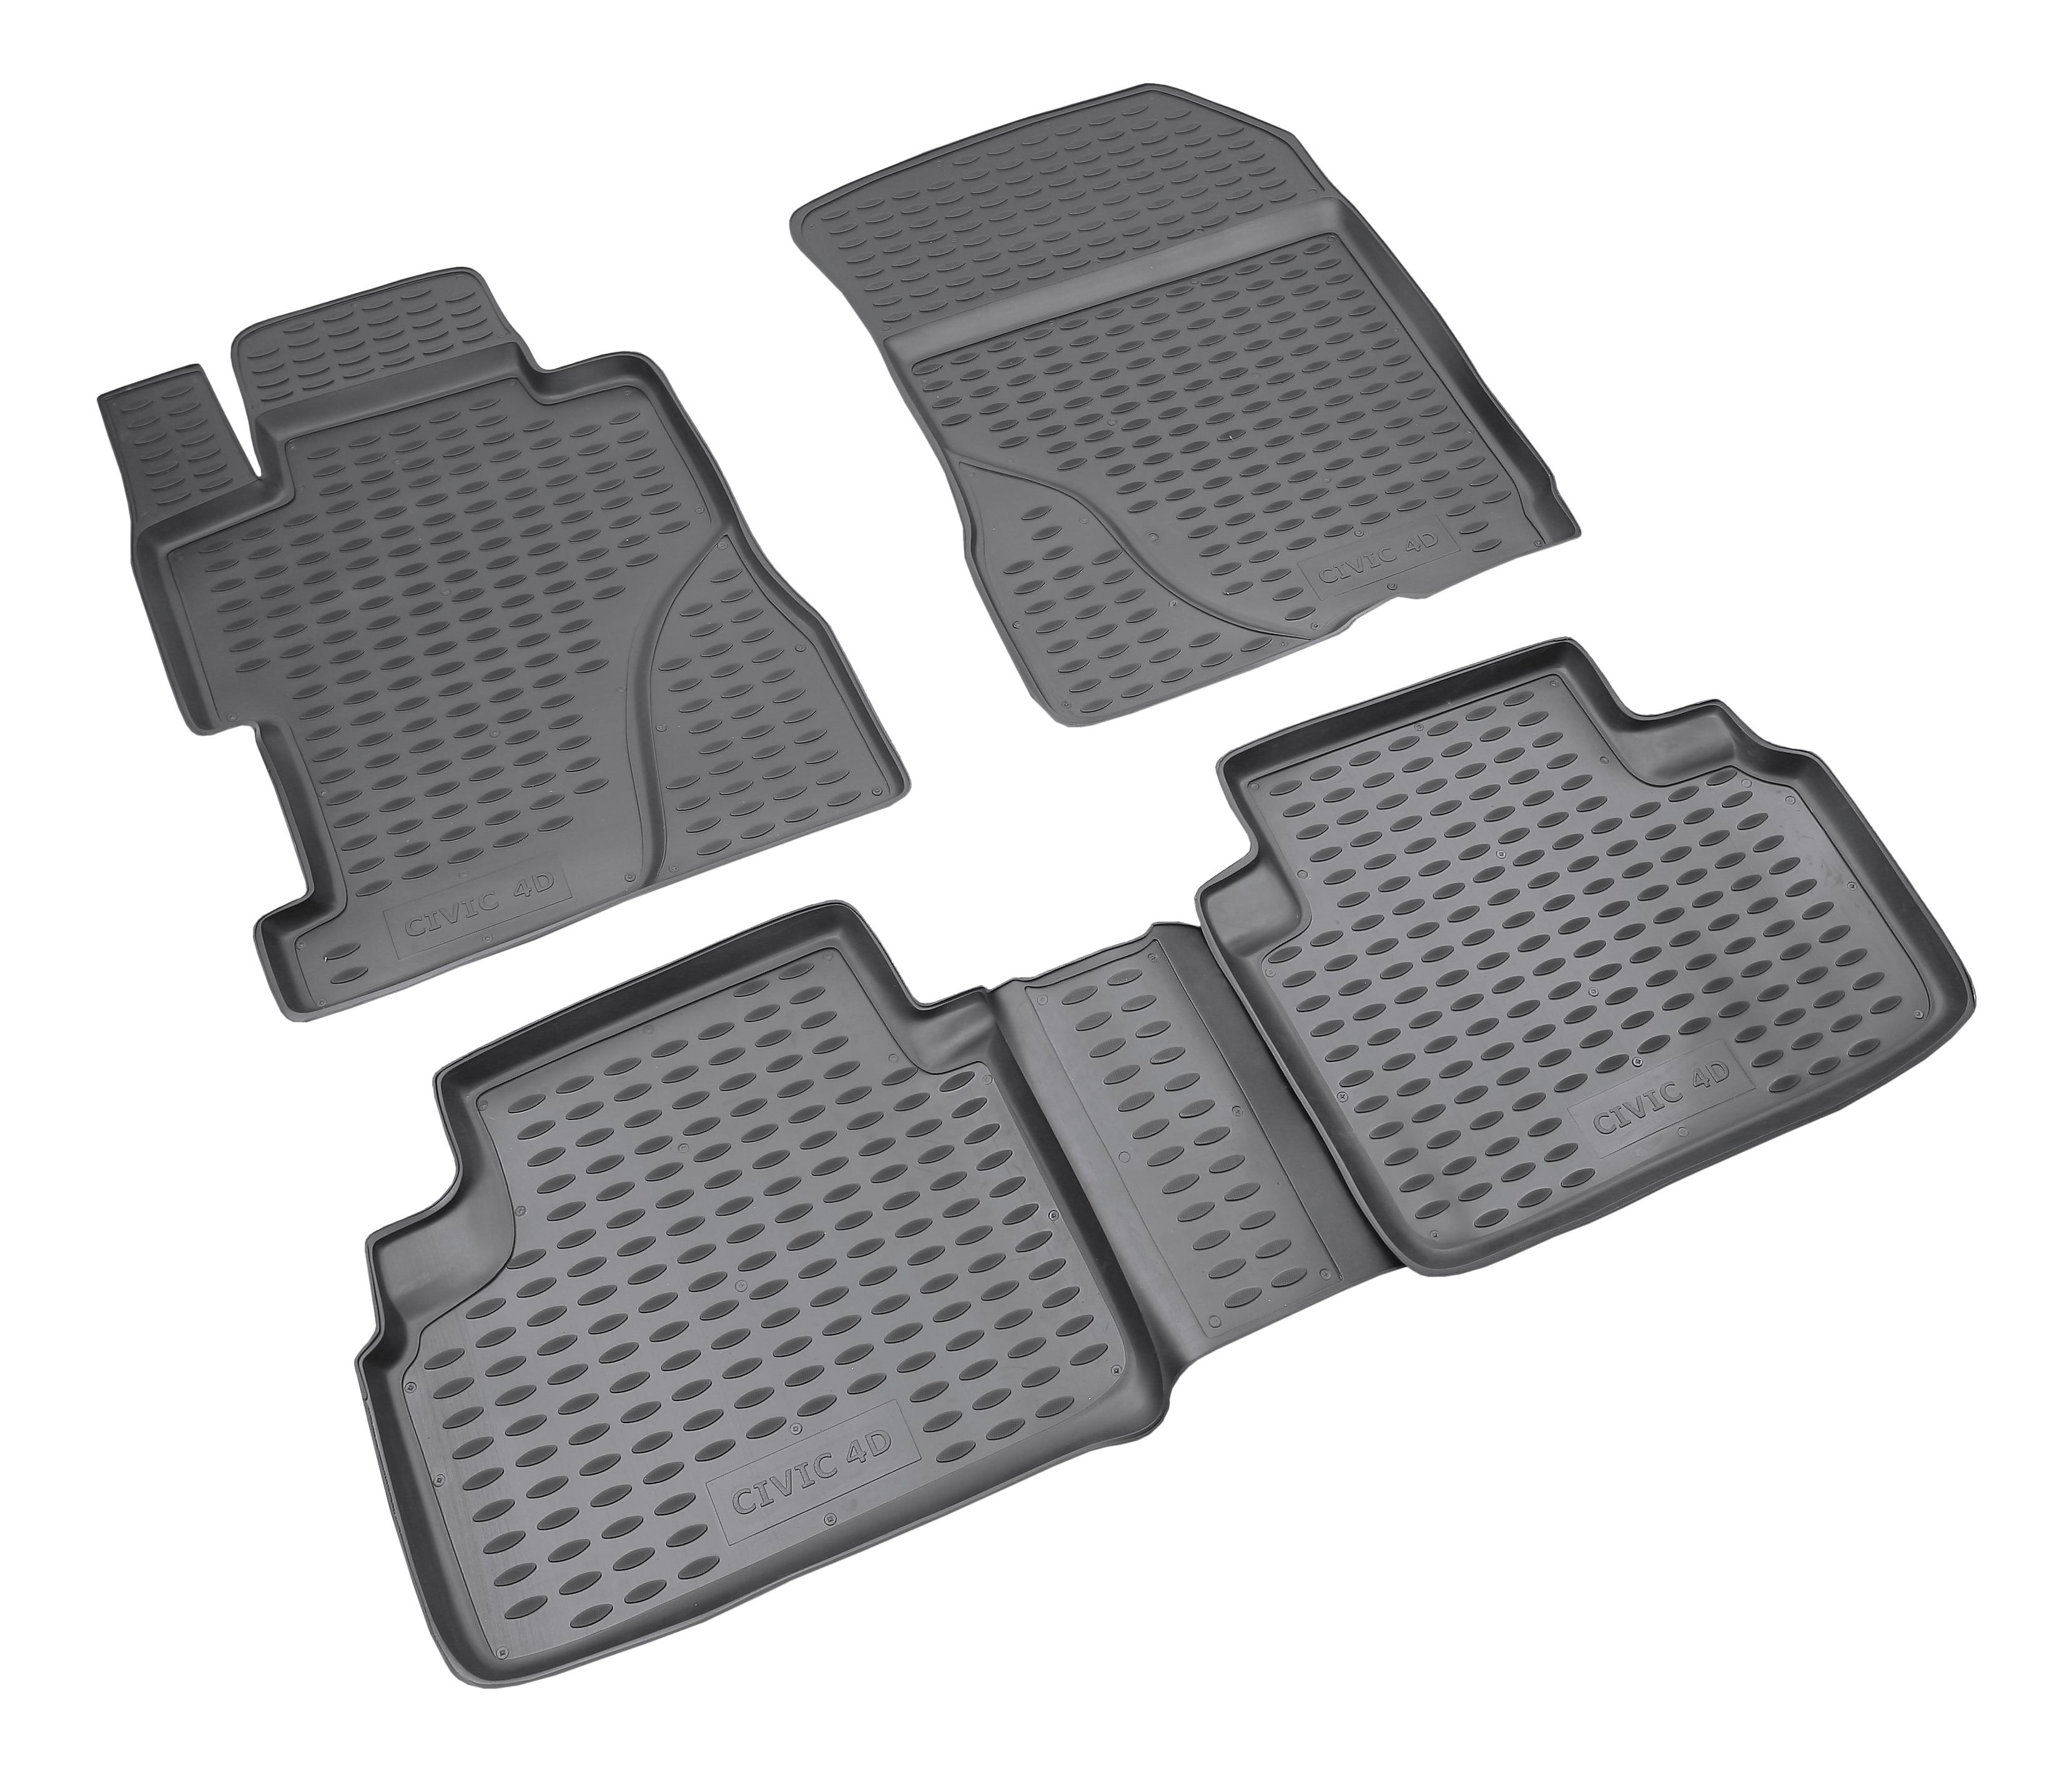 Комплект ковриков в салон автомобиля Autofamily для Honda (NLC.18.09.210k)